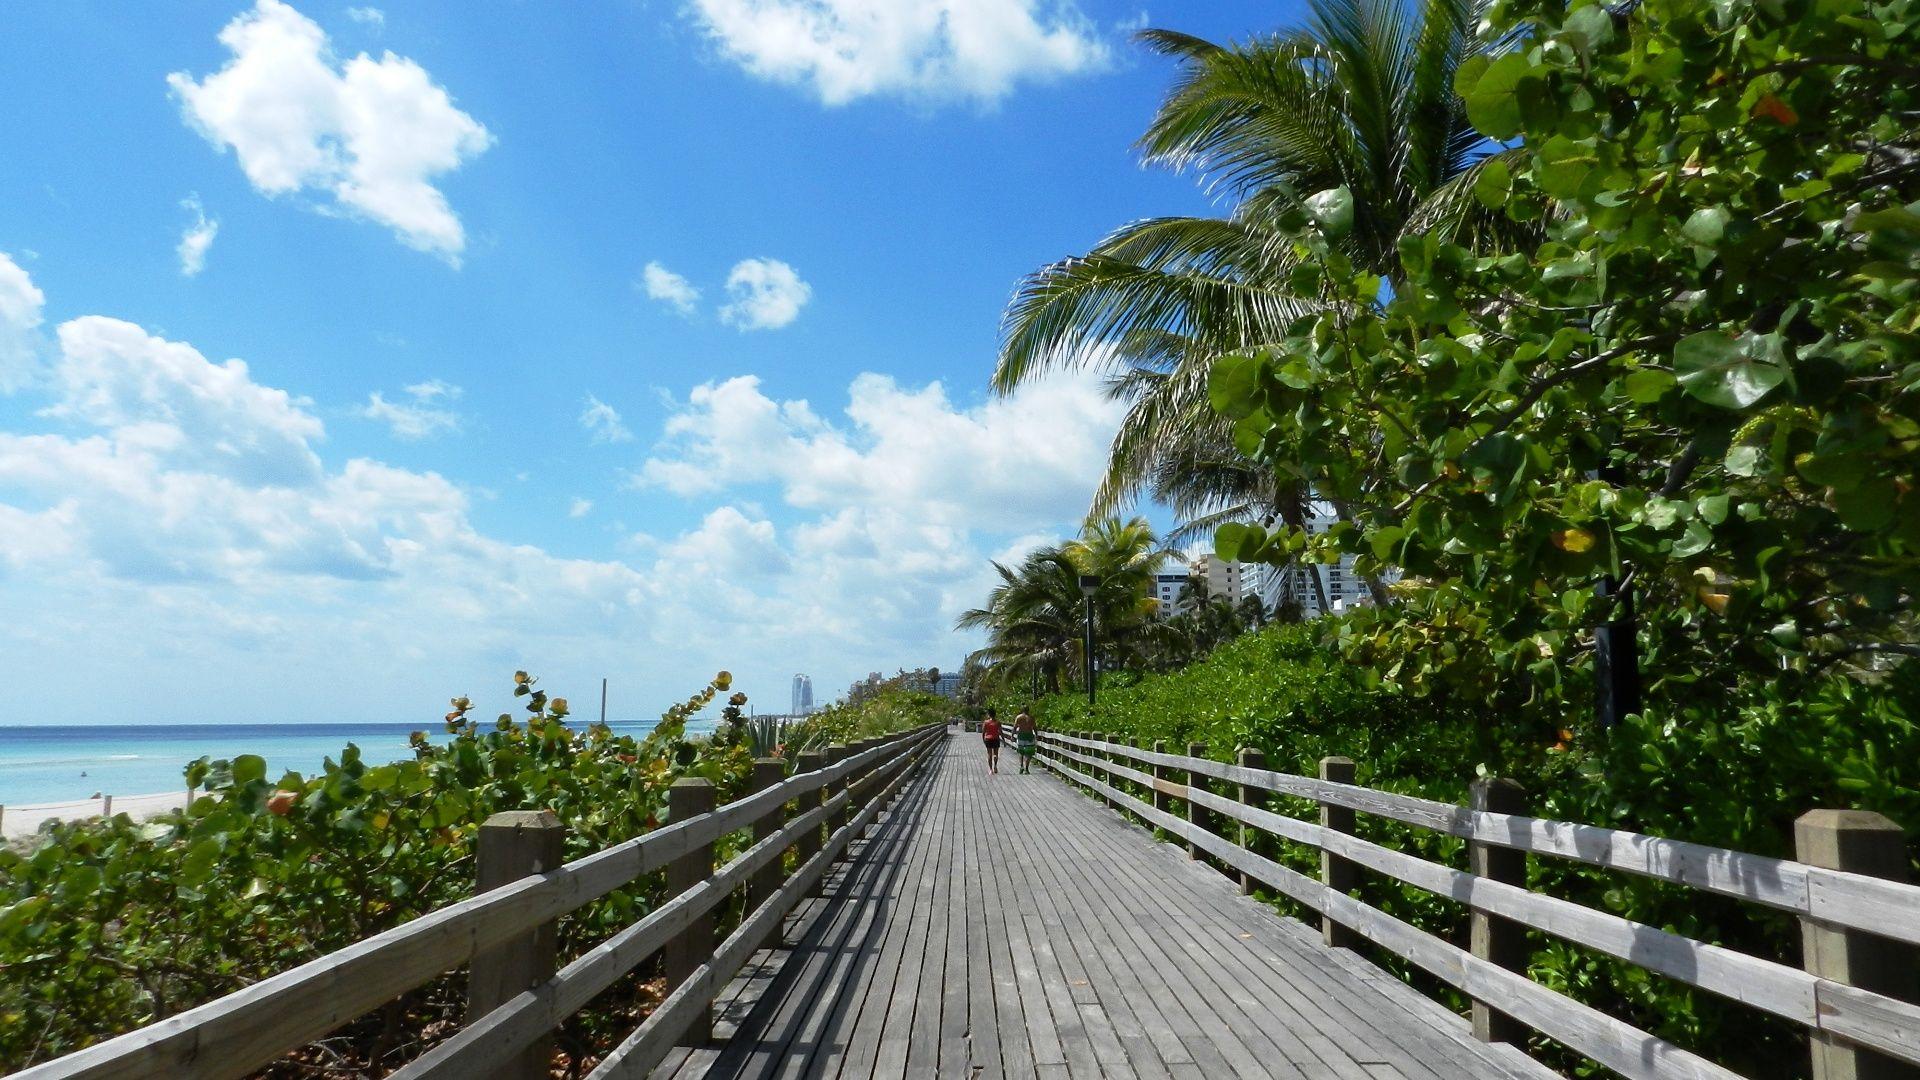 Beautiful Miami Beach Fl!